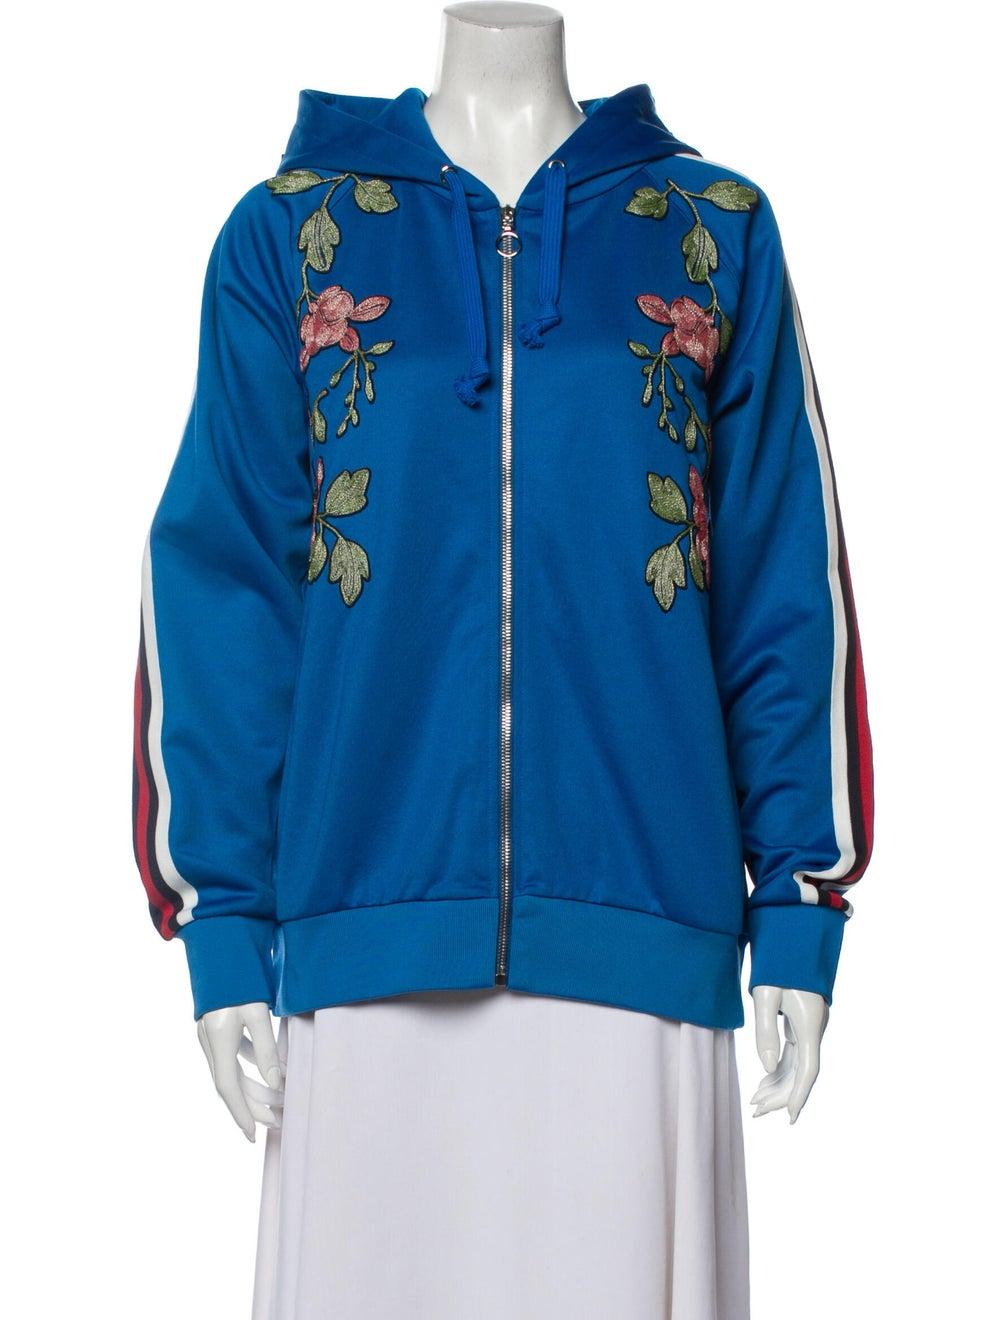 Gucci 2017 Floral Print Sweatshirt Sweatshirt Blue - image 1